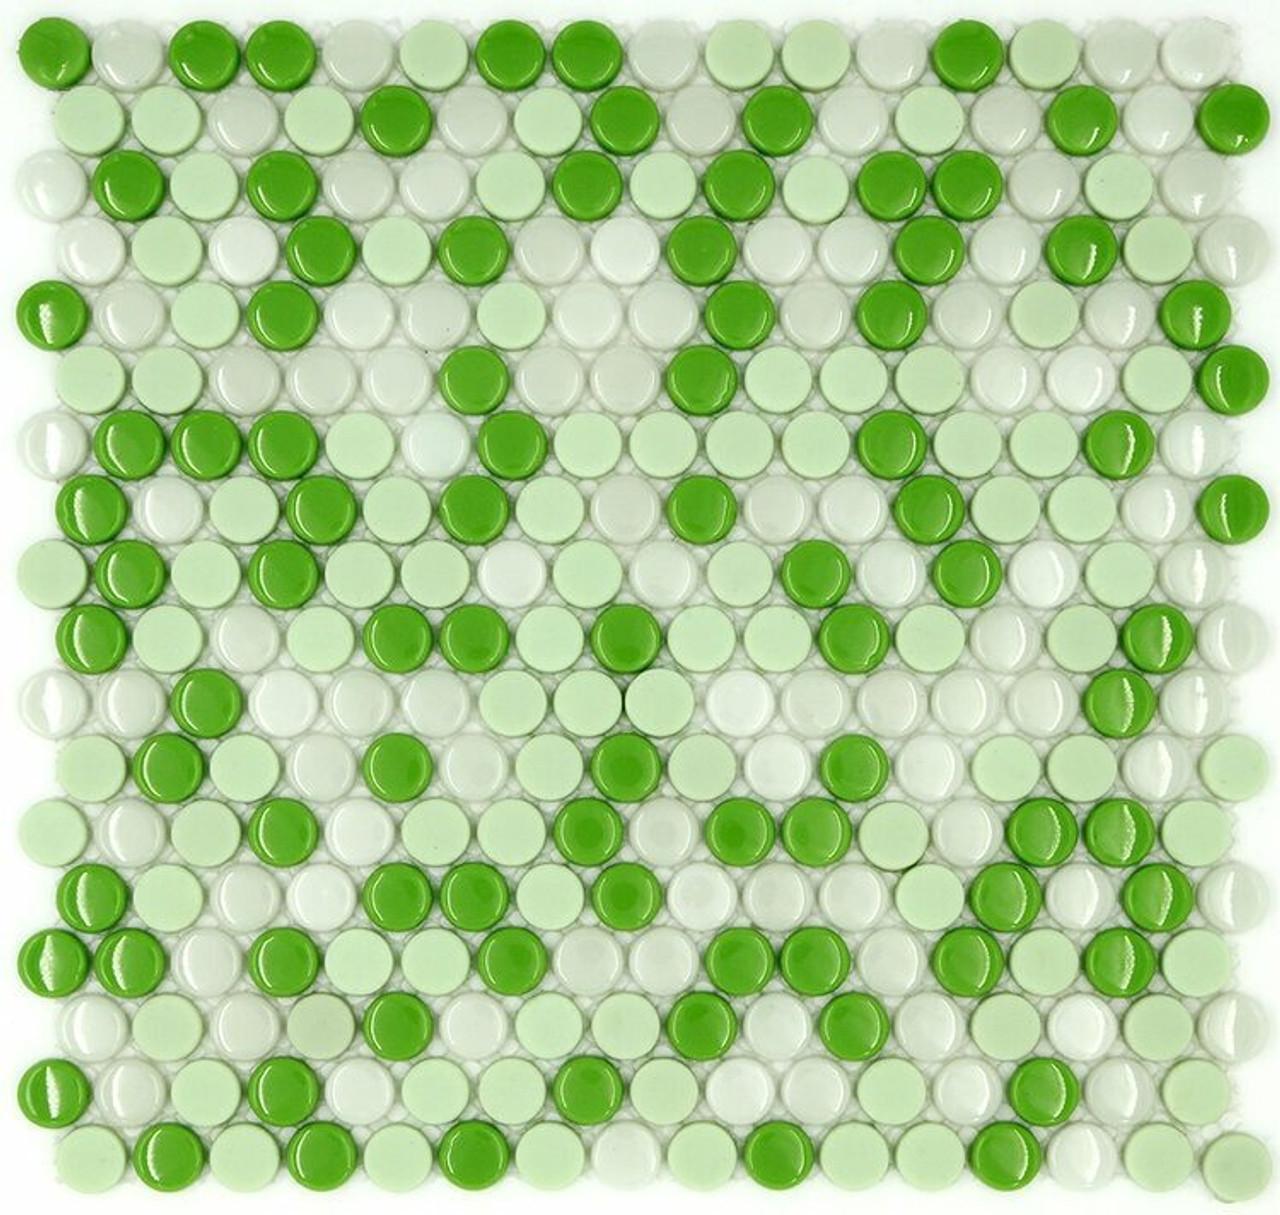 My Tile Backsplash Sicily Collection Series Penny Round Snapdragon